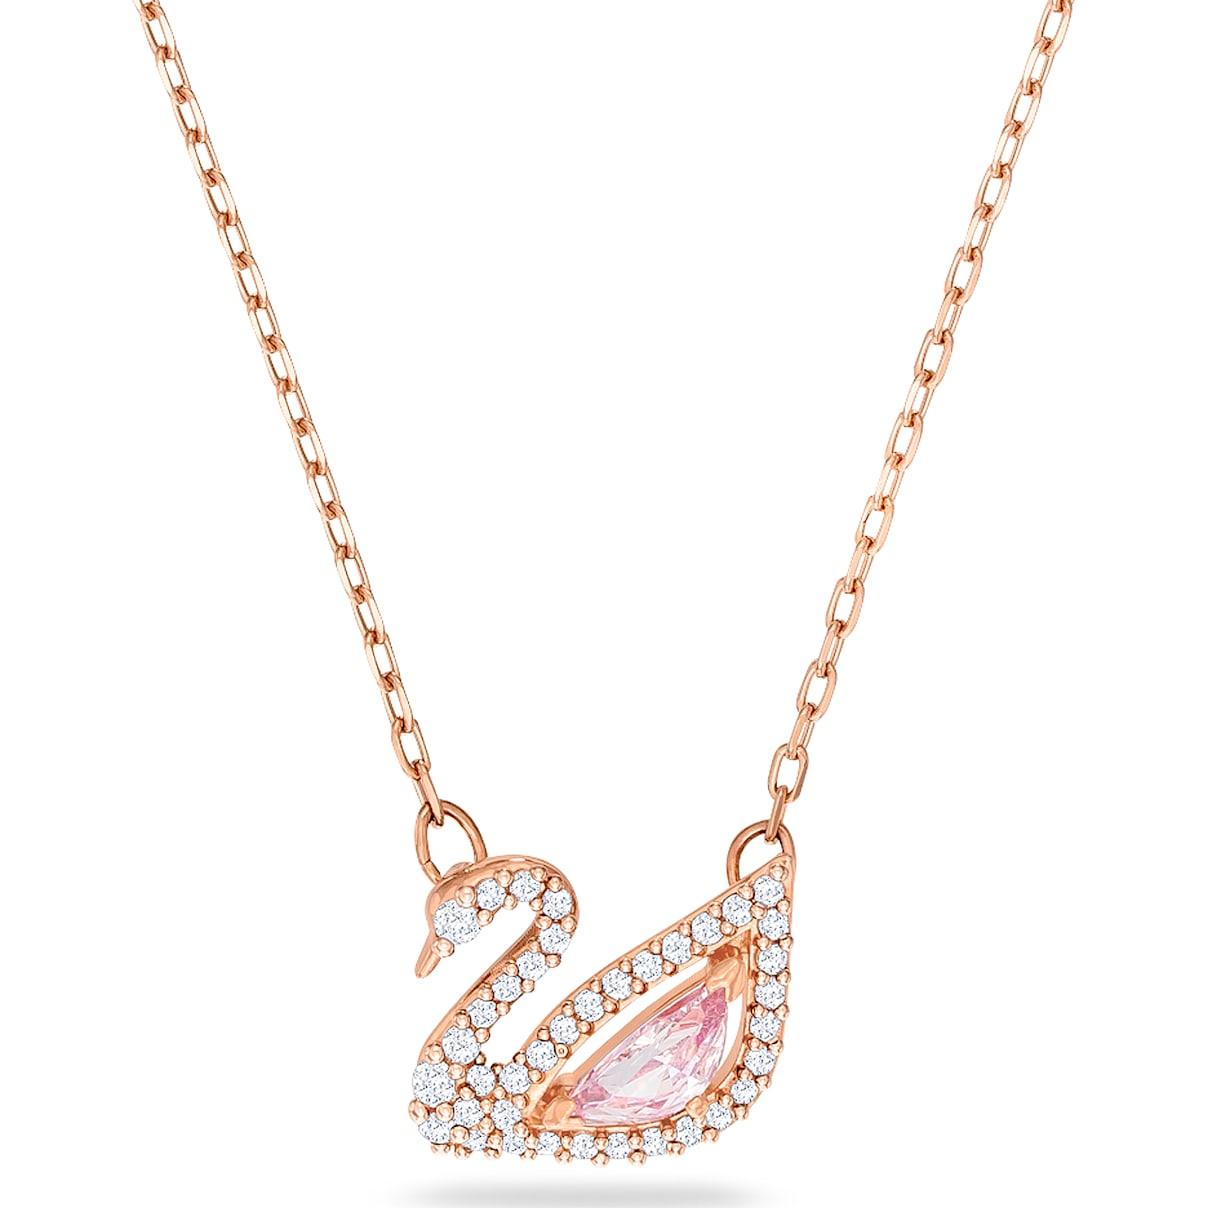 Swarovski Dazzling Swan Necklace, Multi-colored, Rose-gold tone plated